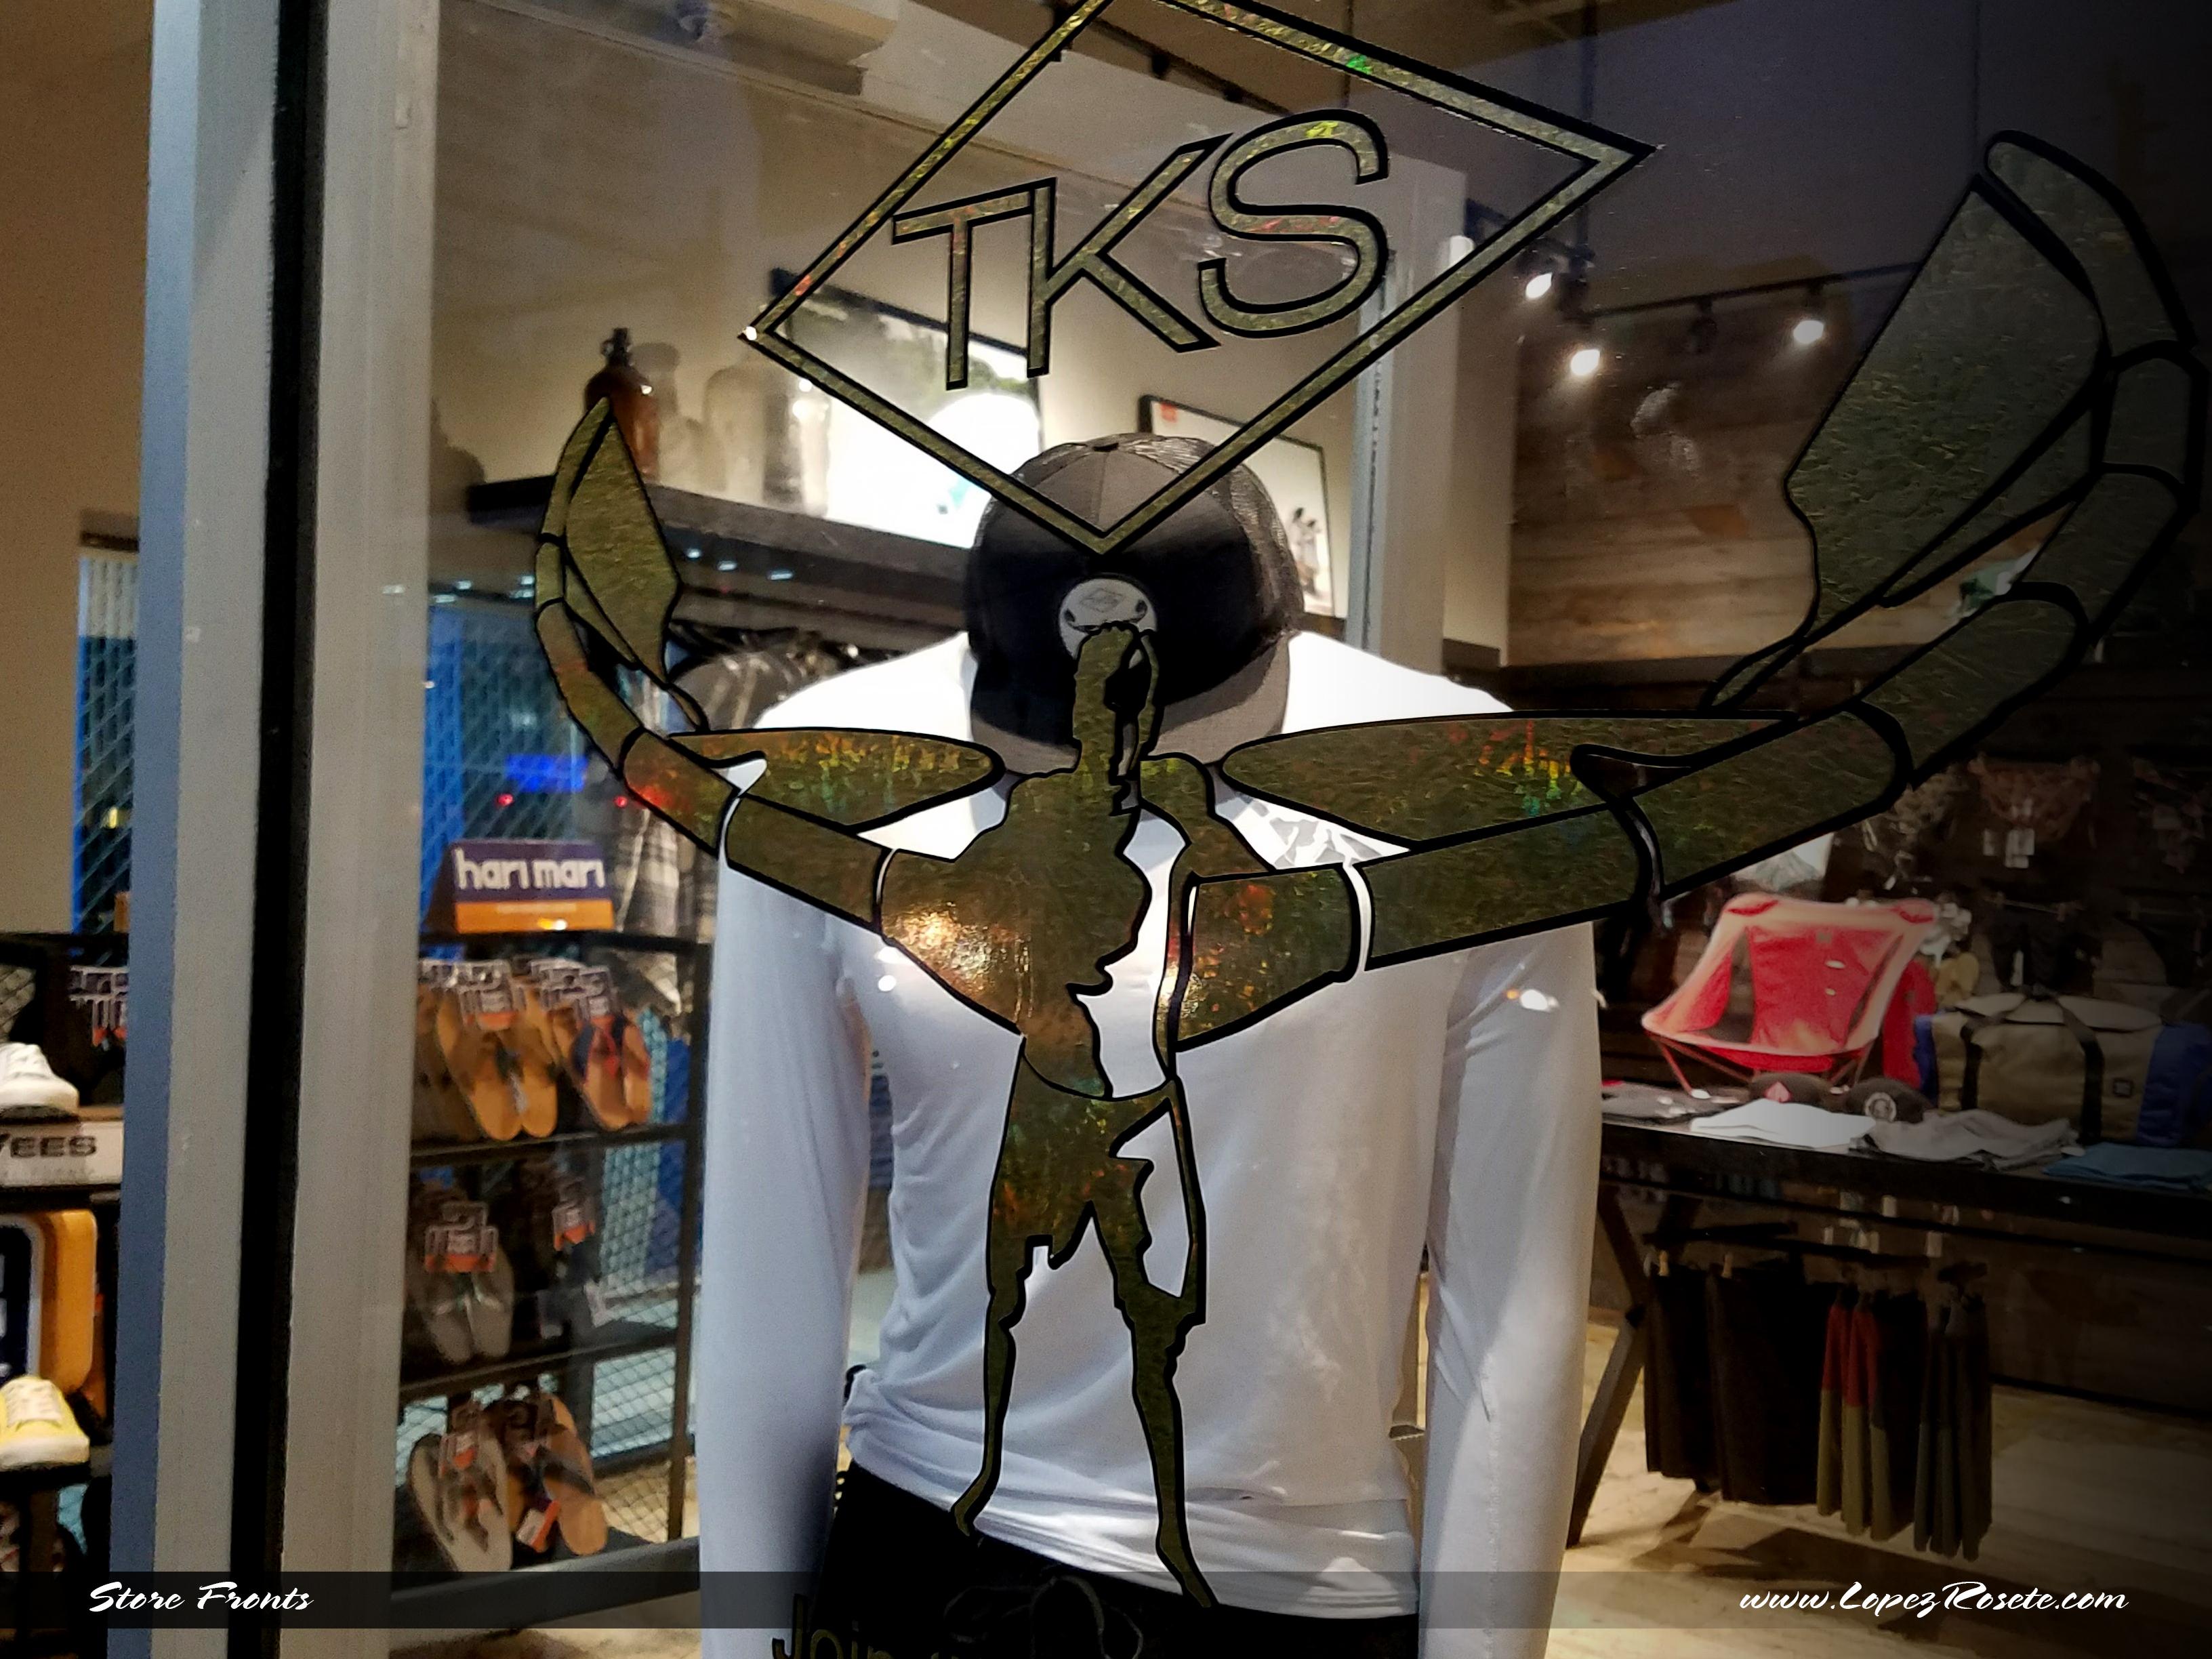 TKS_CoconutGrove